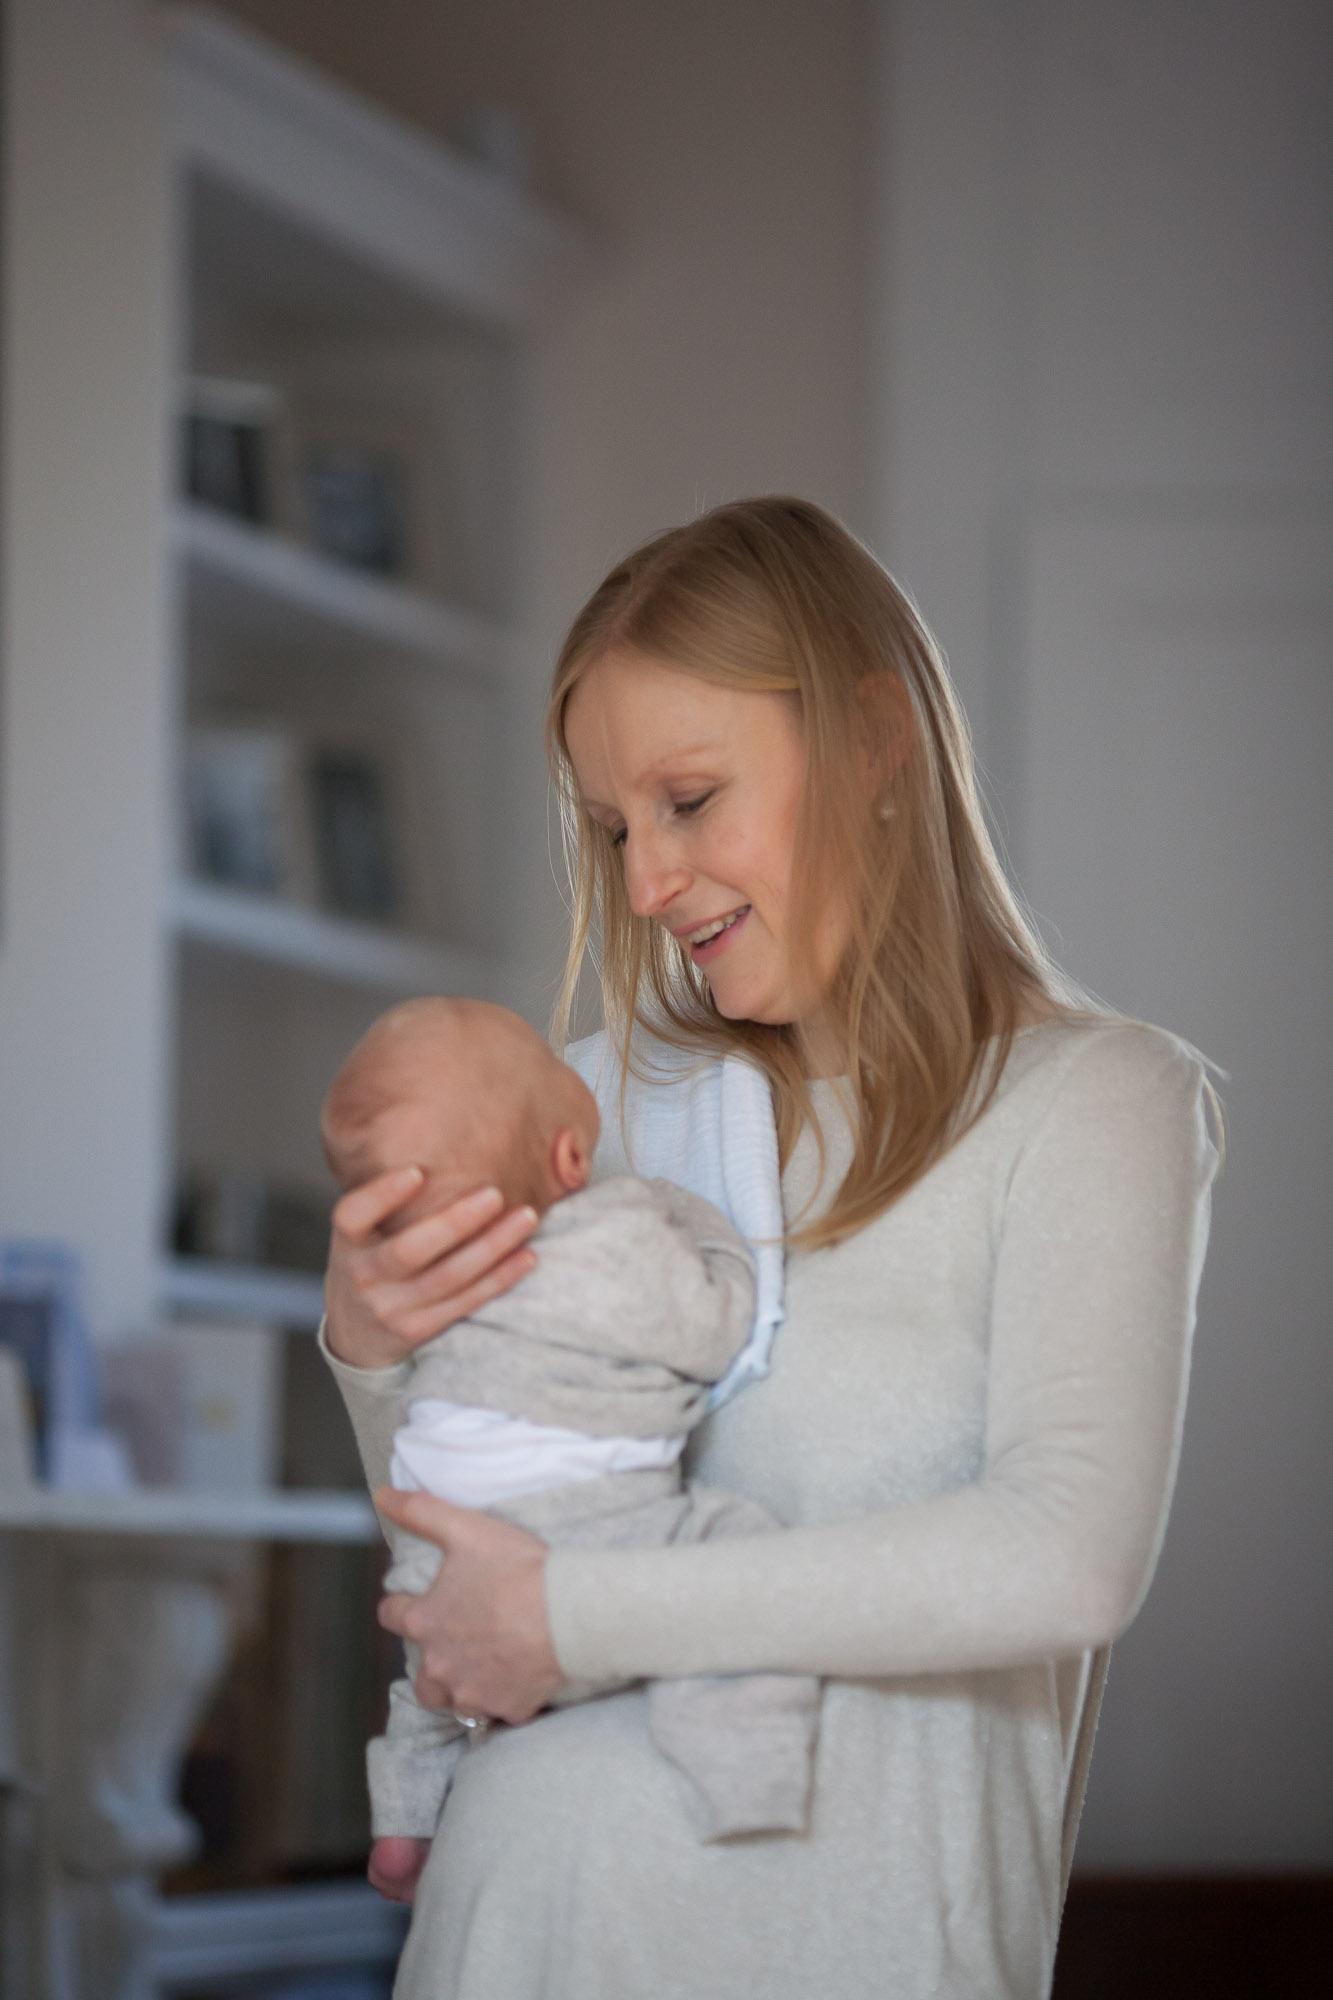 family-portrait-baby-photographer-003.jpg